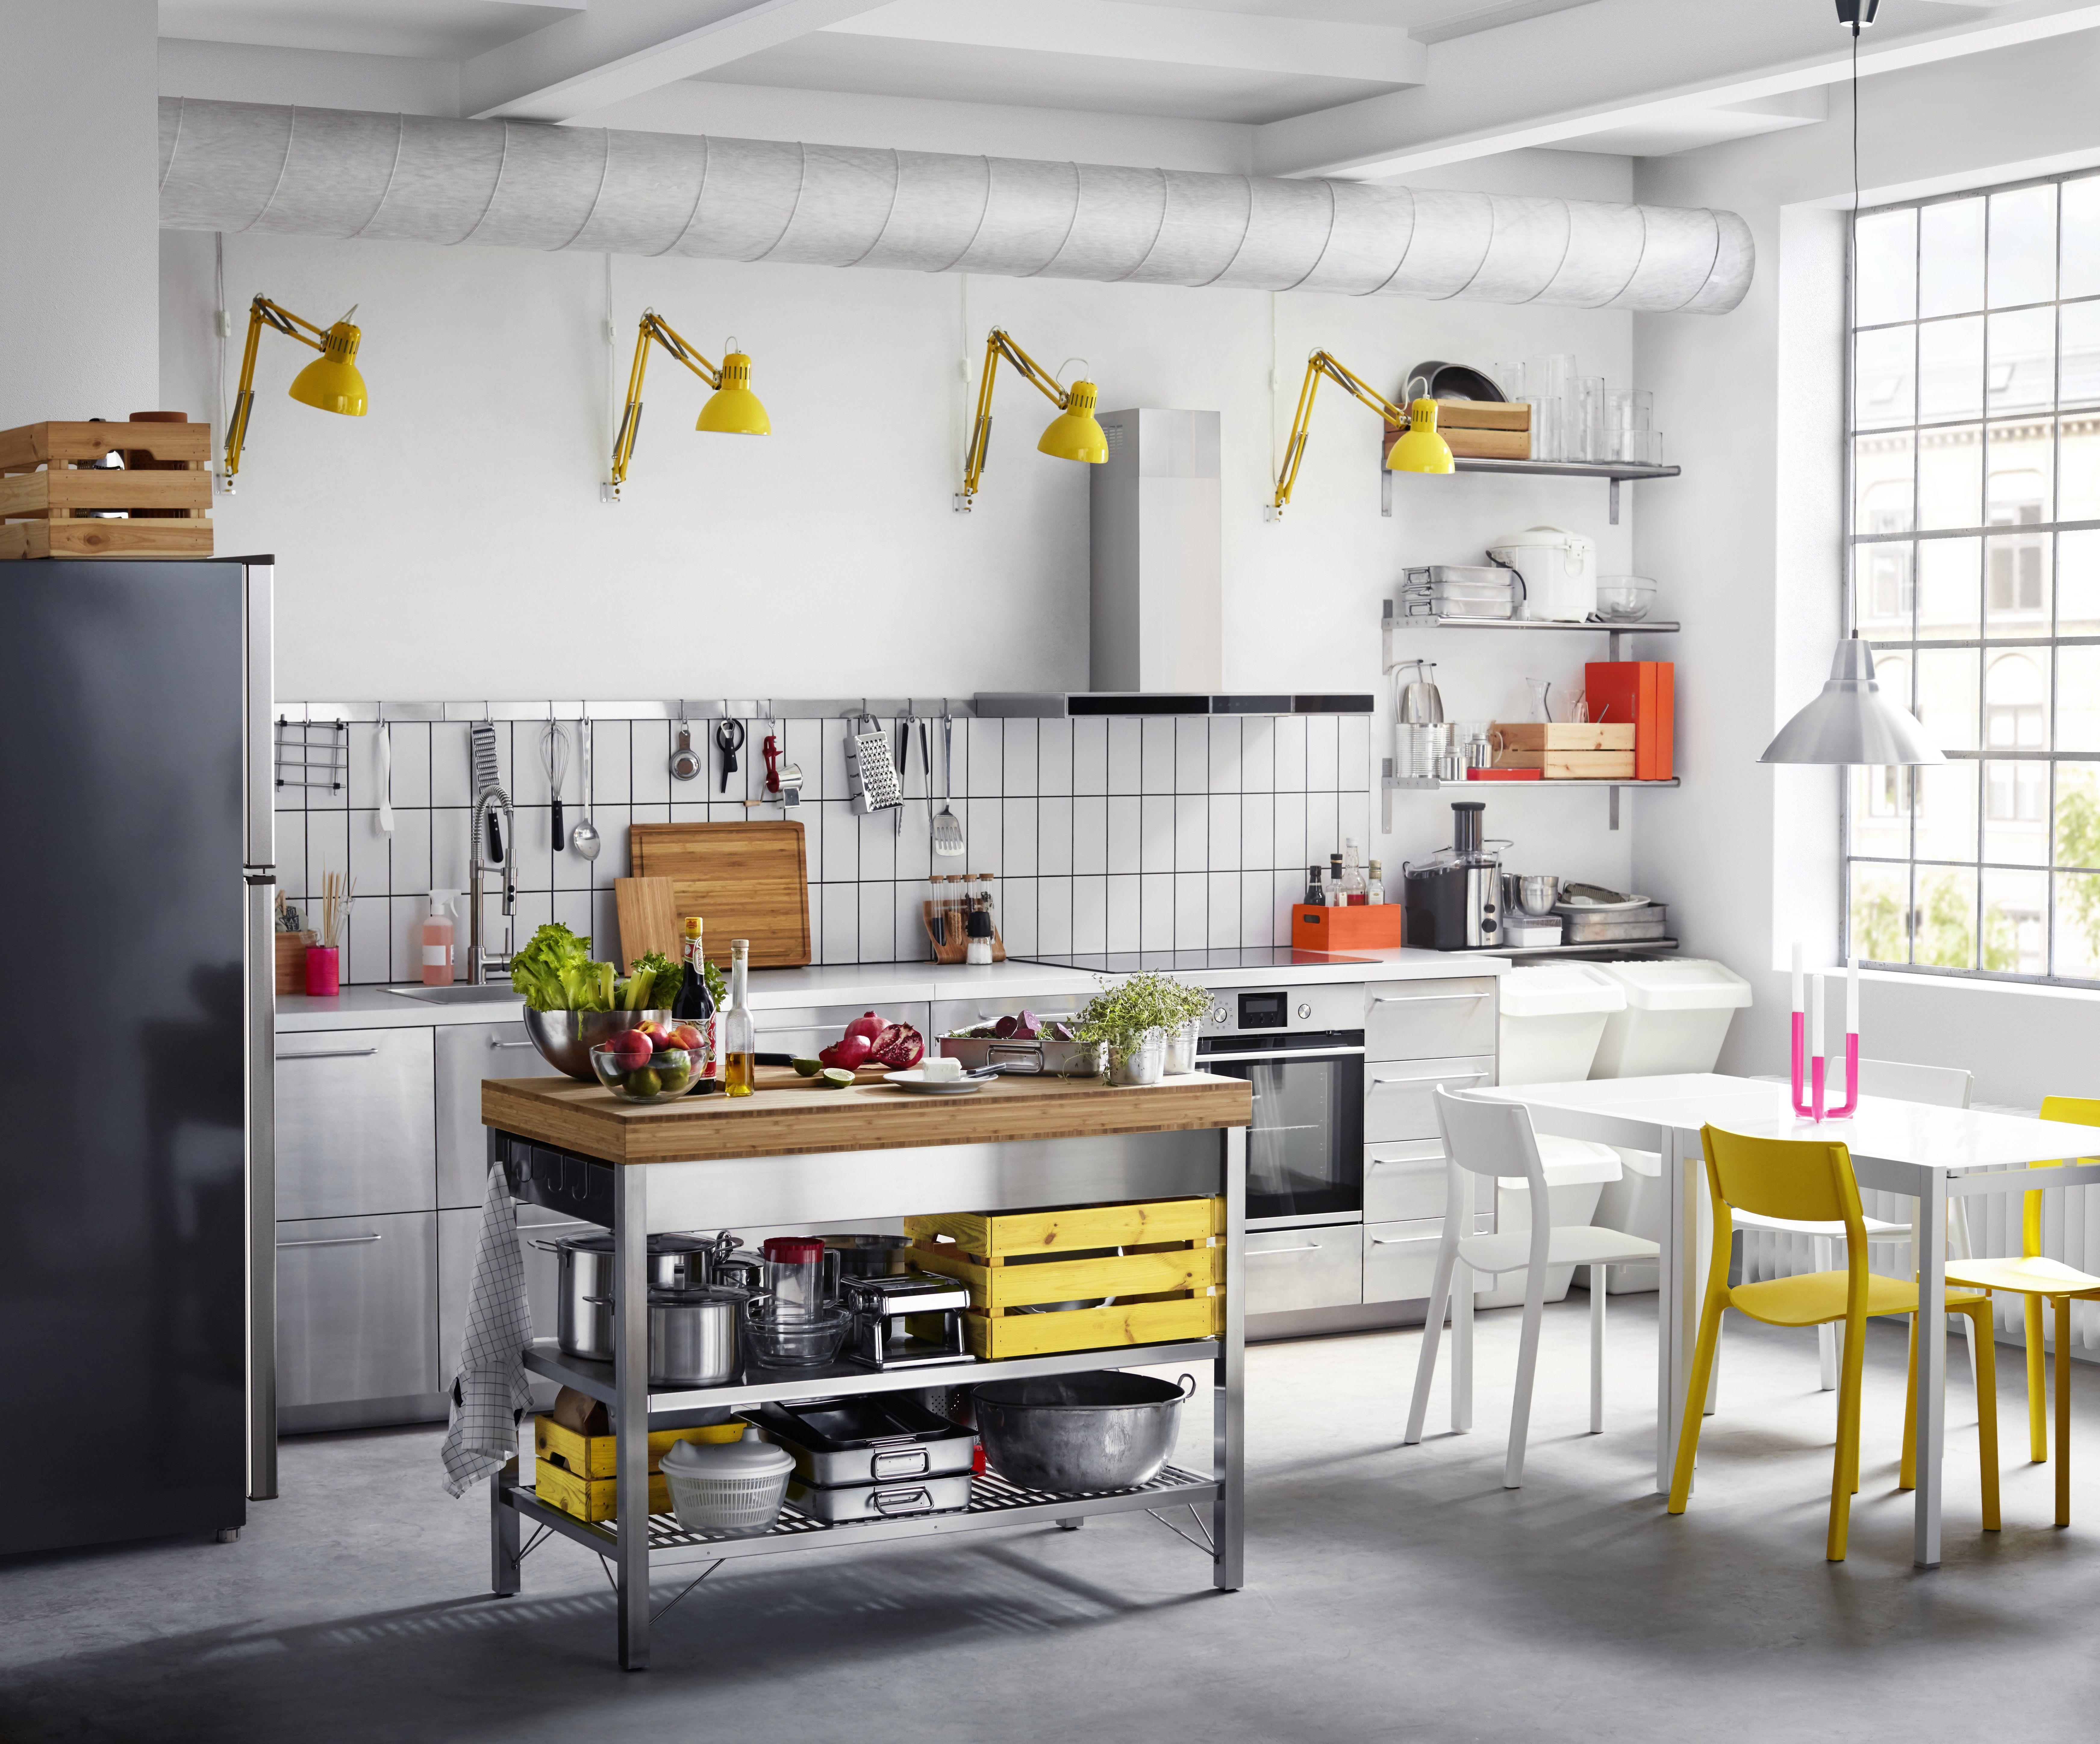 Grevsta Deur Roestvrij Staal In 2019 Stainless Kitch Ikea